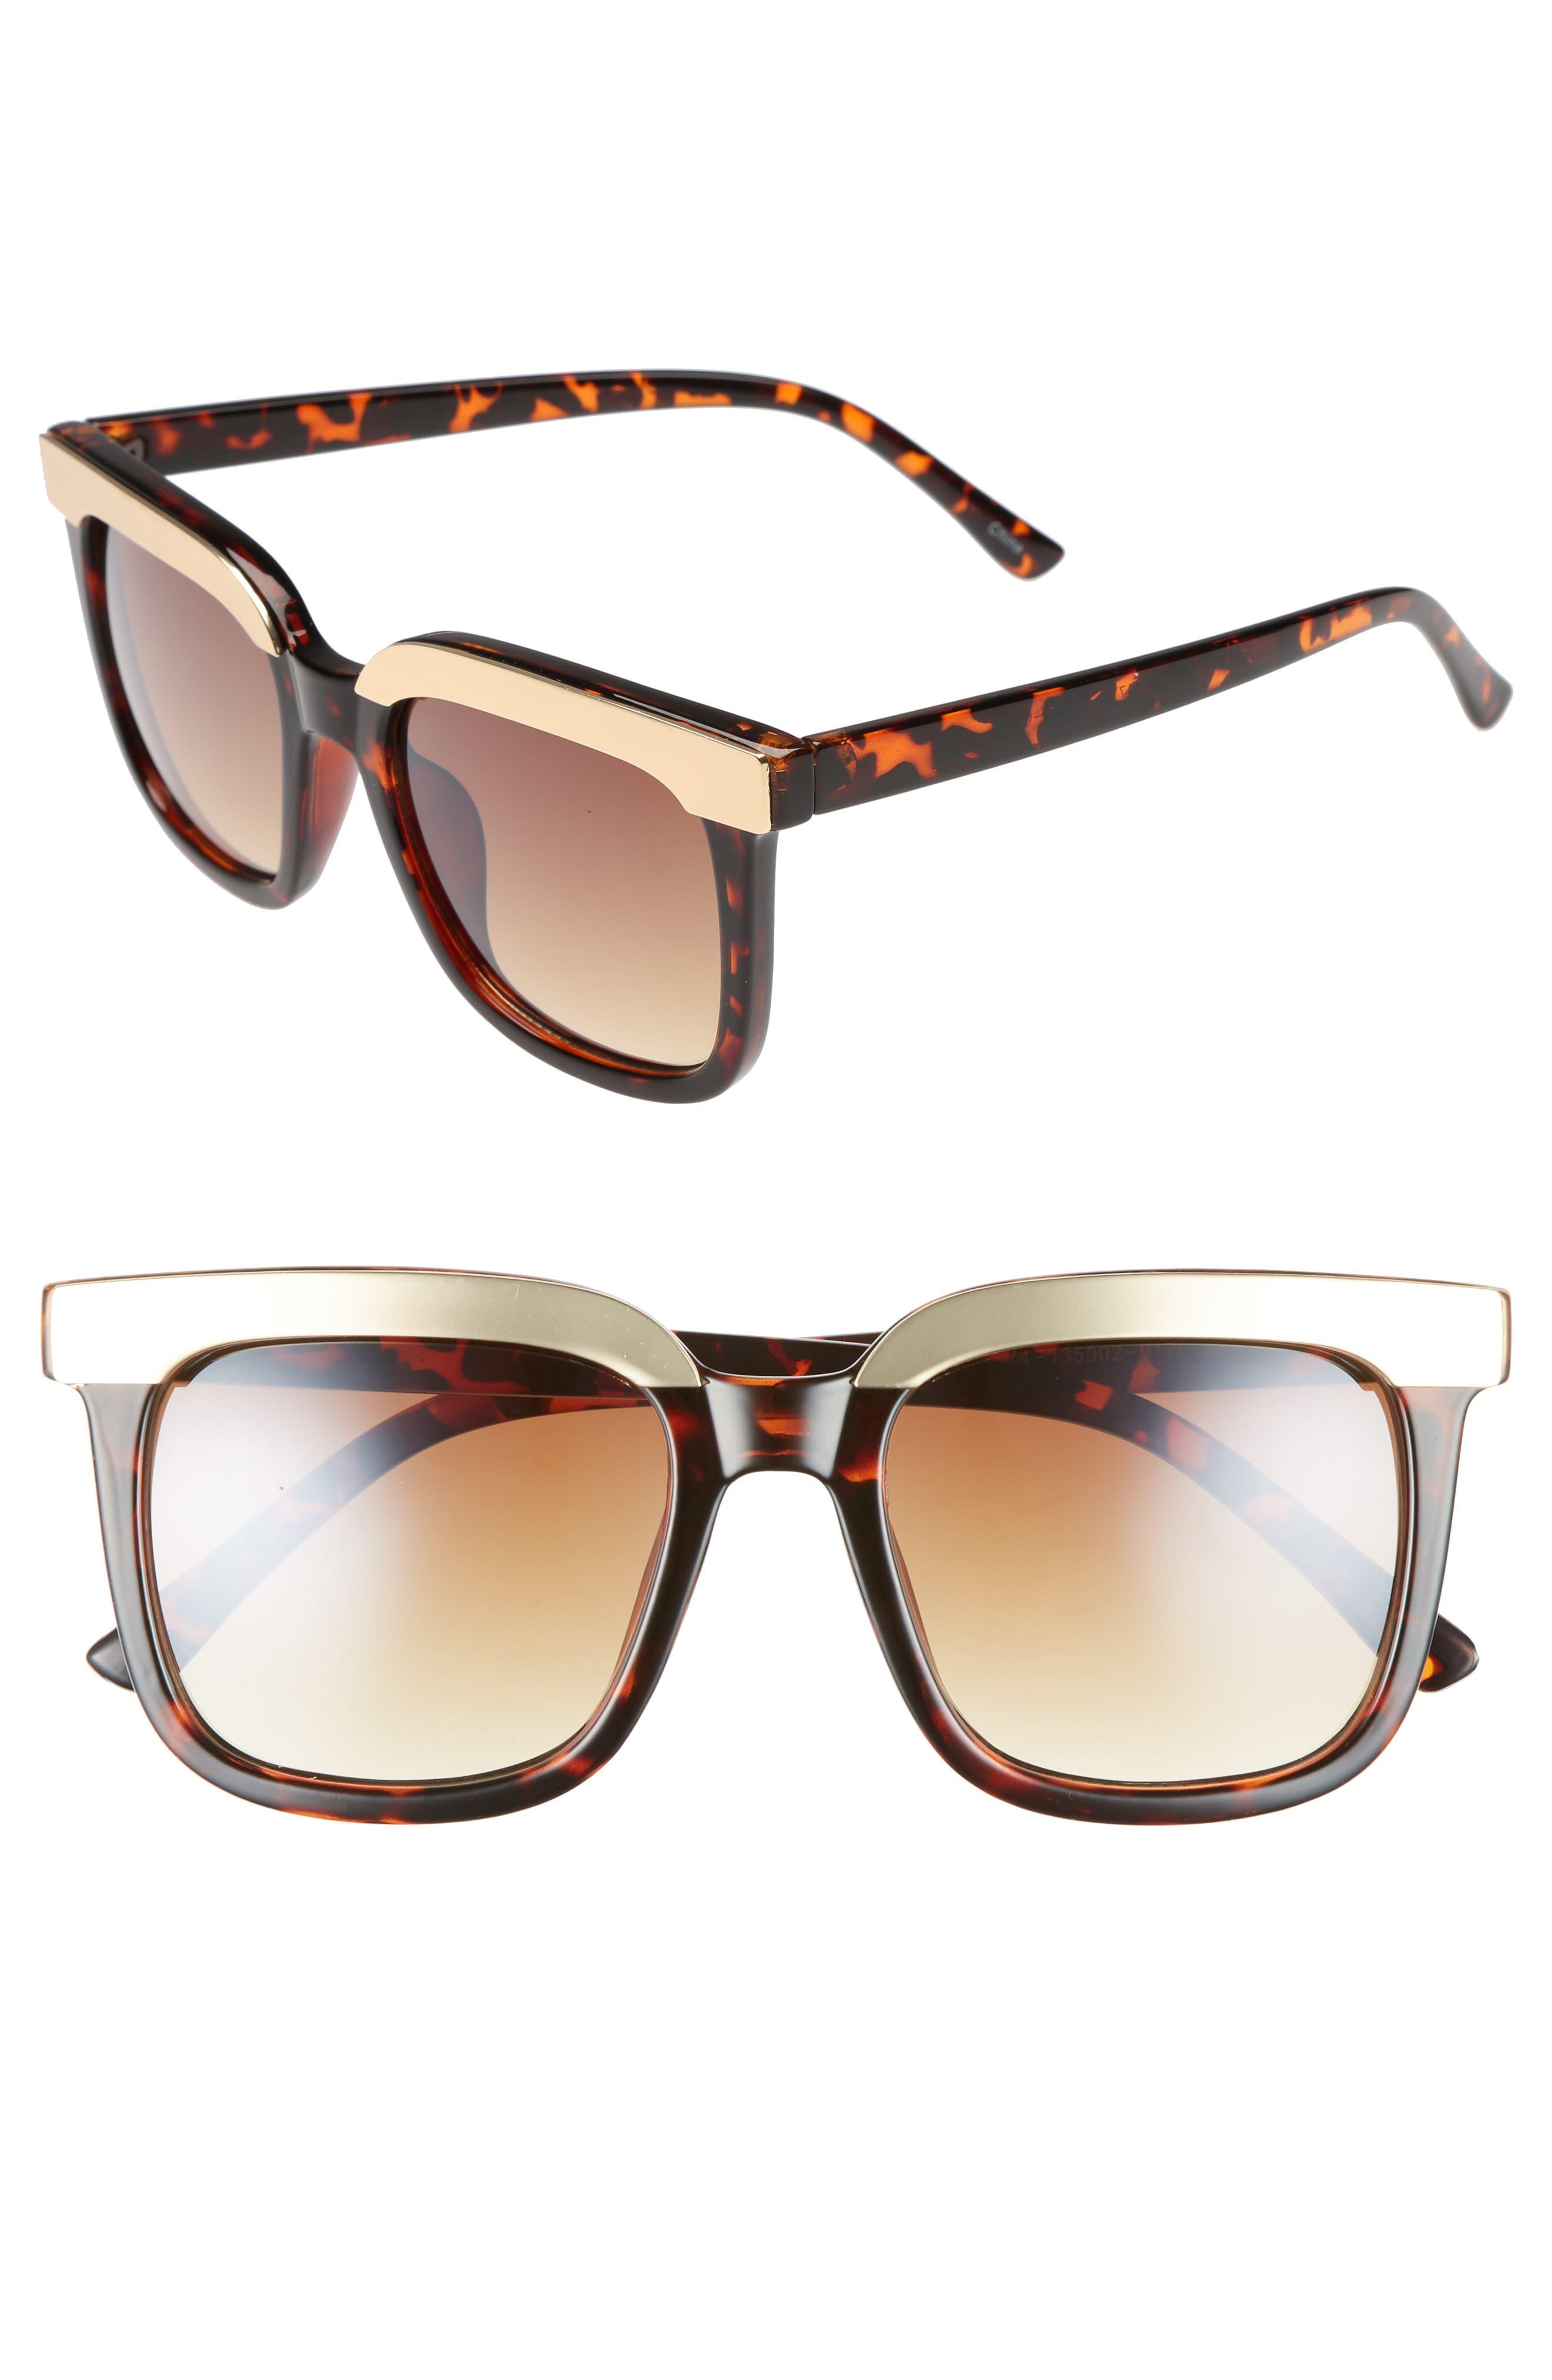 52mm Metal Dipped Square Sunglasses,                             Main thumbnail 1, color,                             200